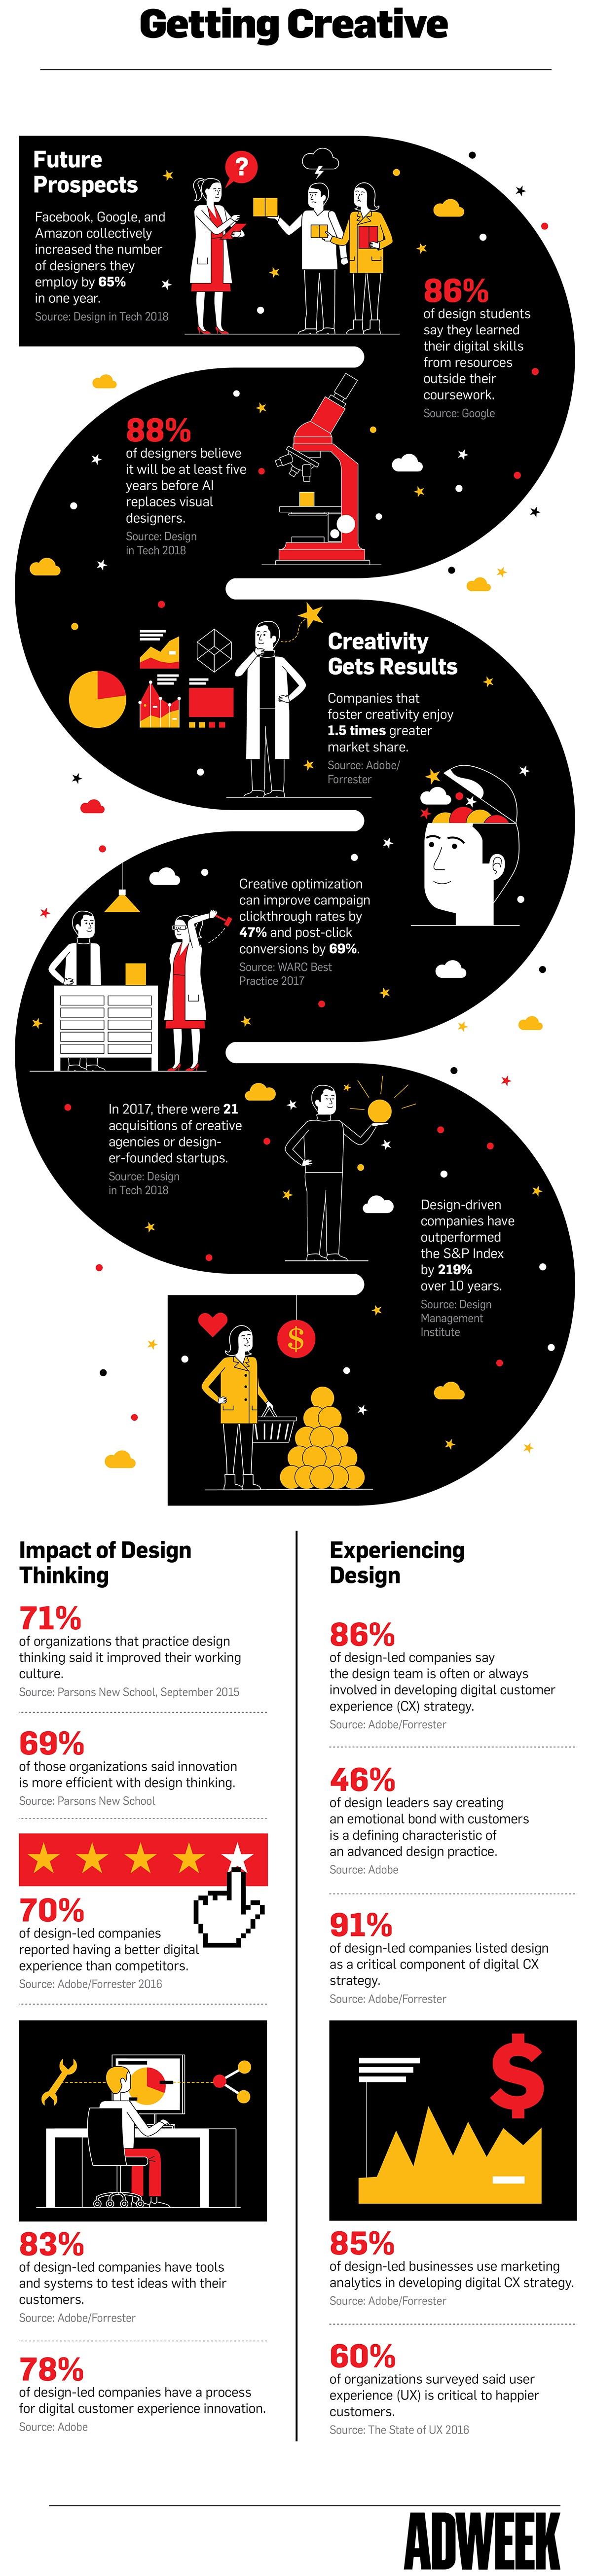 design-thinking-customer-experience-adweek